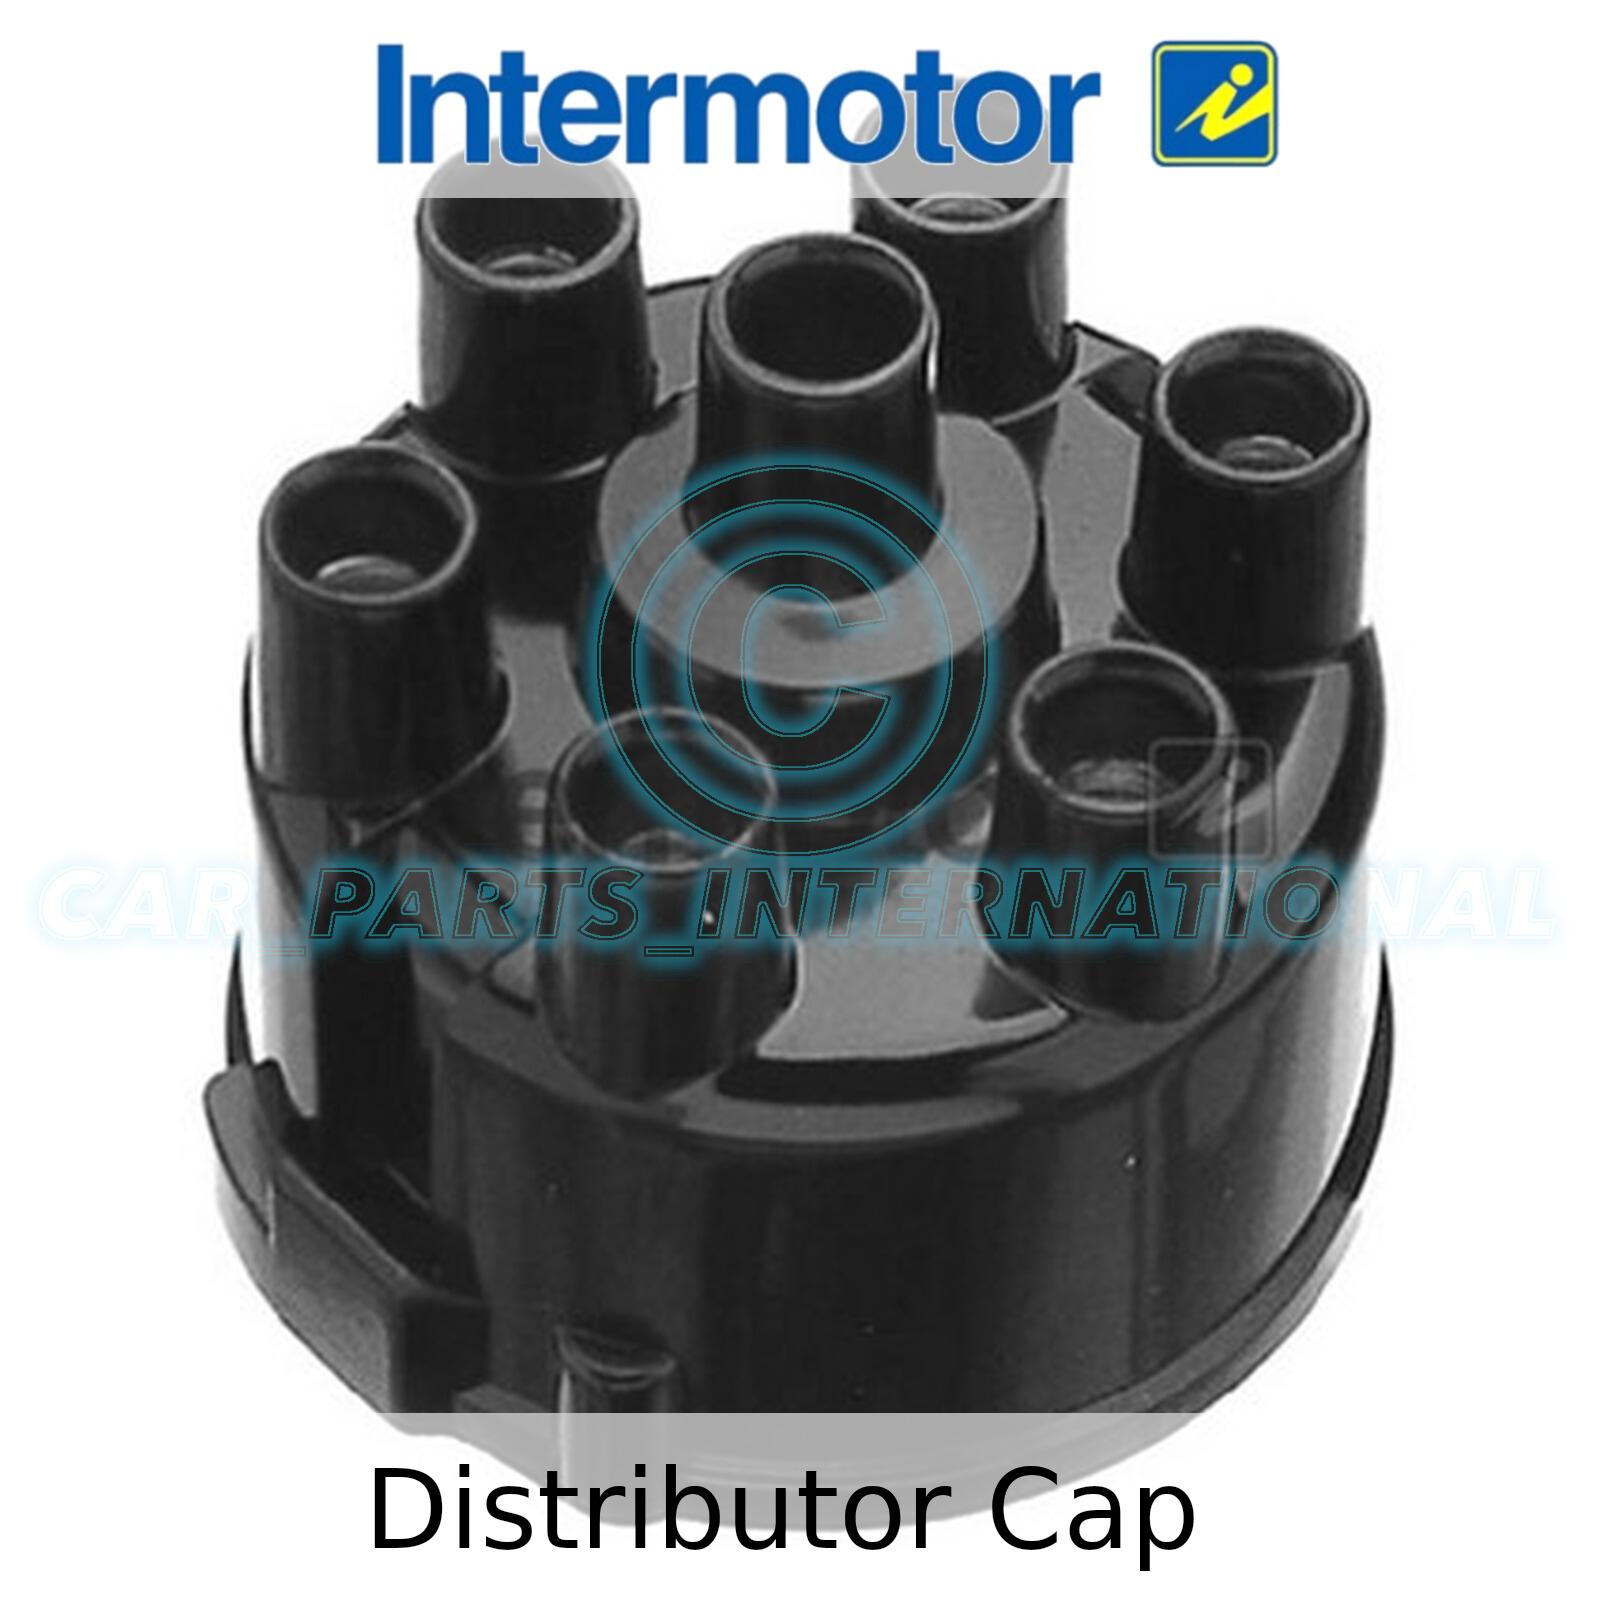 ORIGINALE OE Quality INTERMOTOR Distributore Cap 44760